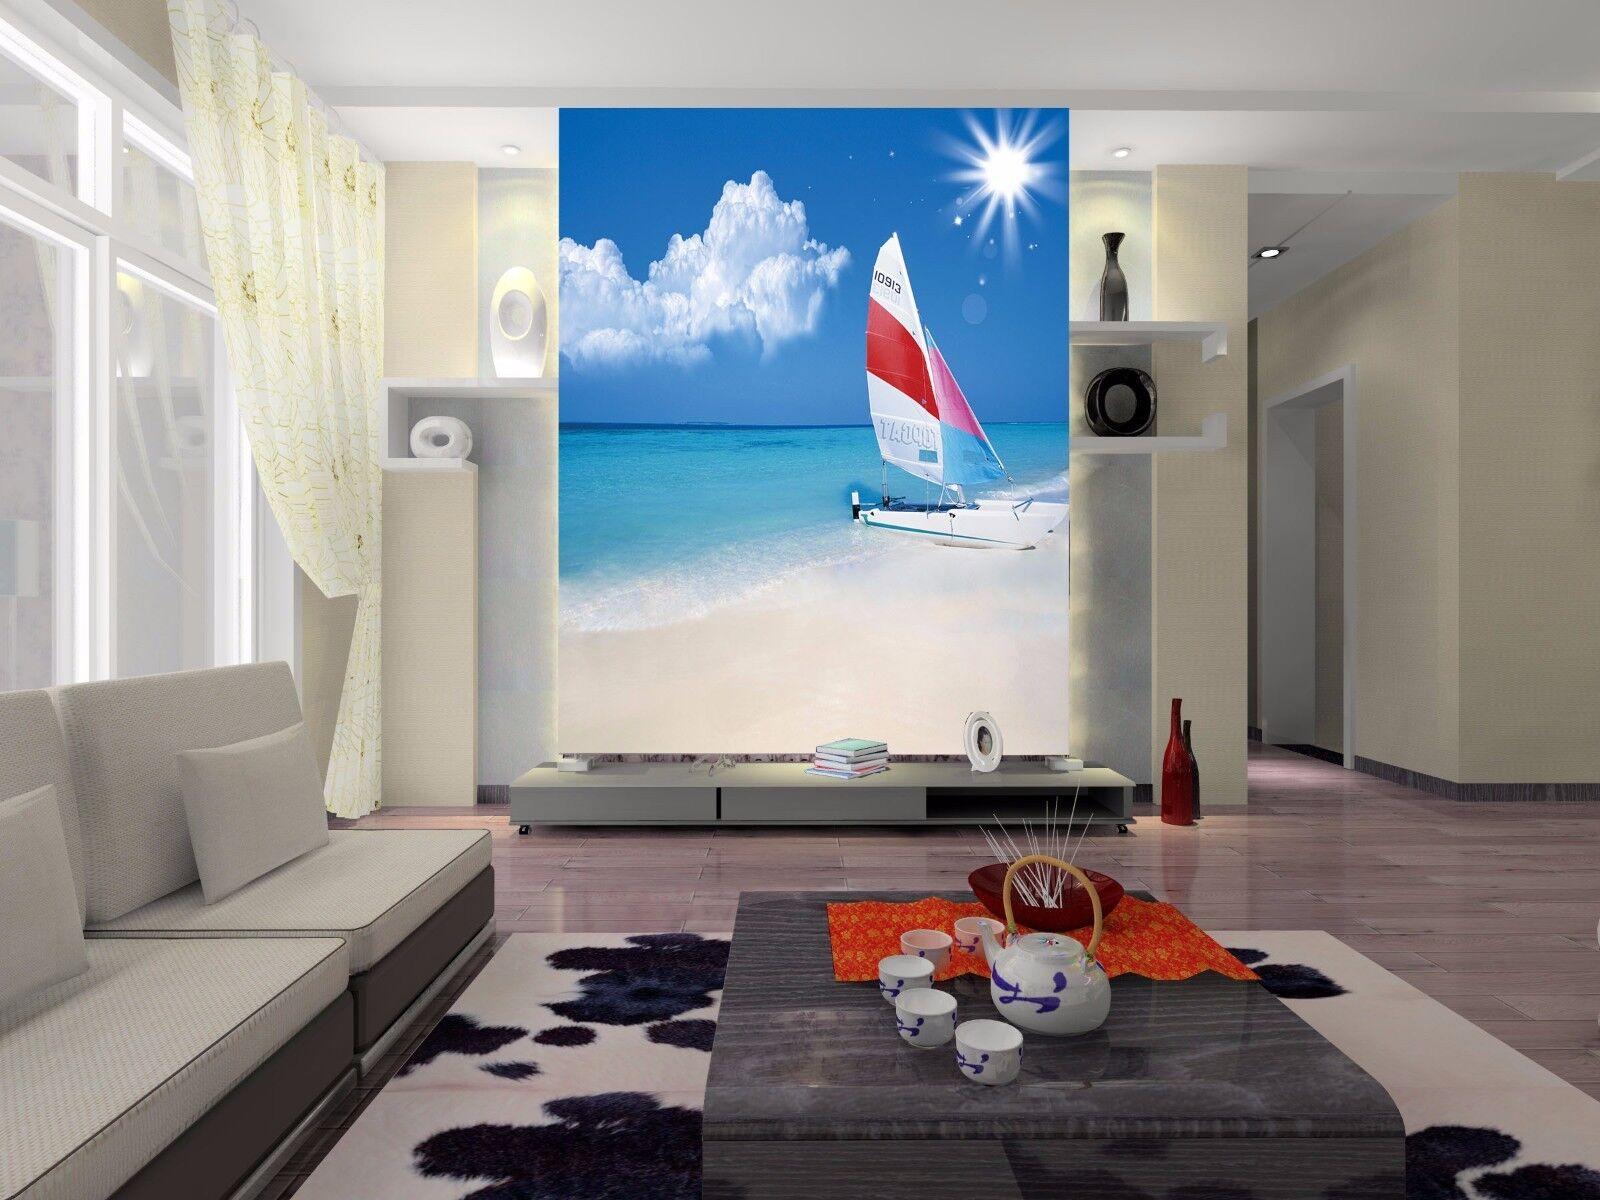 3D 3D 3D Sonne Segeln Strand 84 Tapete Wandgemälde Tapete Tapeten Bild Familie DE | Ausgezeichnetes Handwerk  | Ausgang  | Guter Markt  b5f9c6